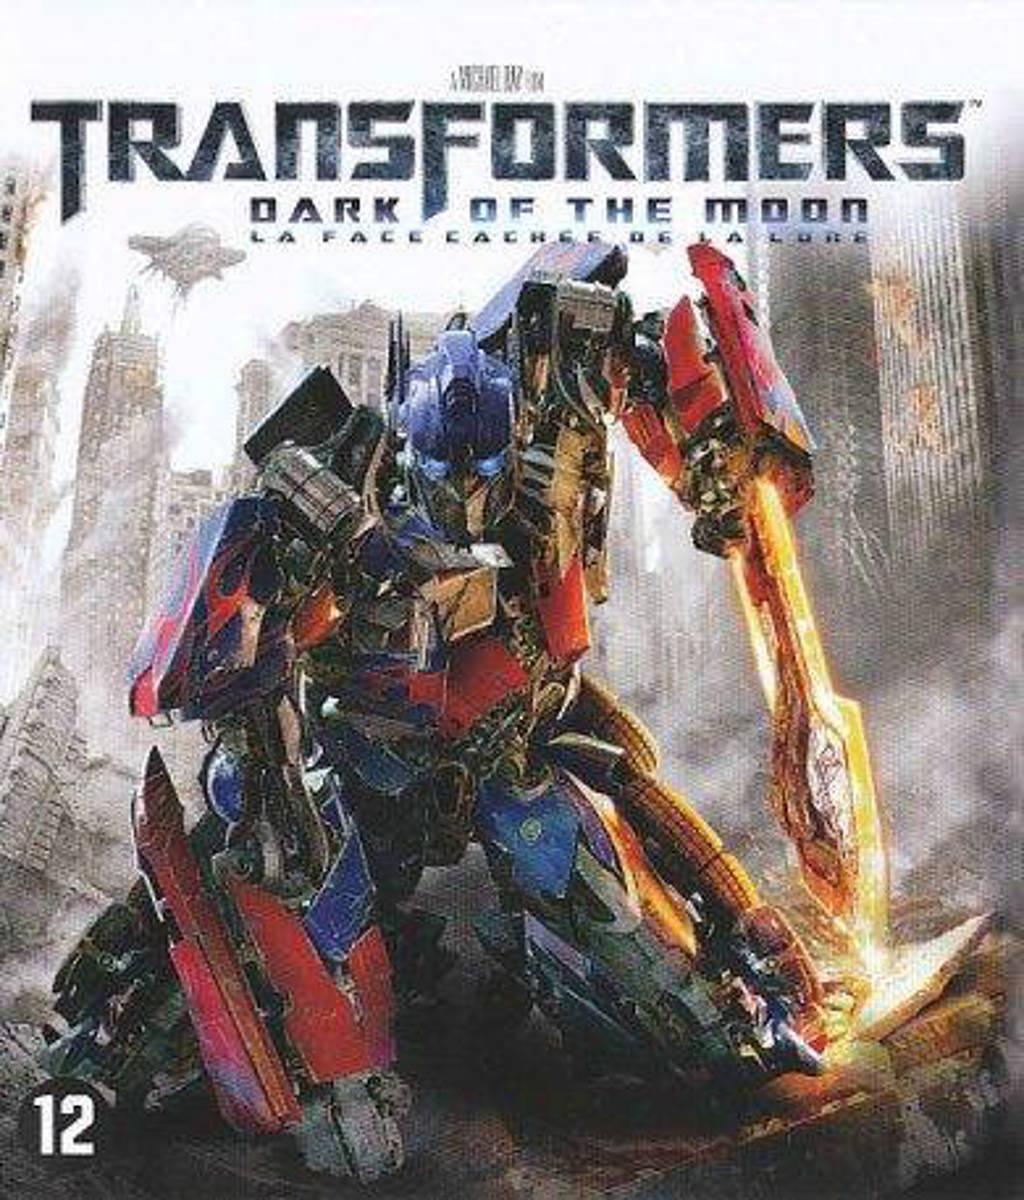 Transformers - Dark of the moon (Blu-ray)